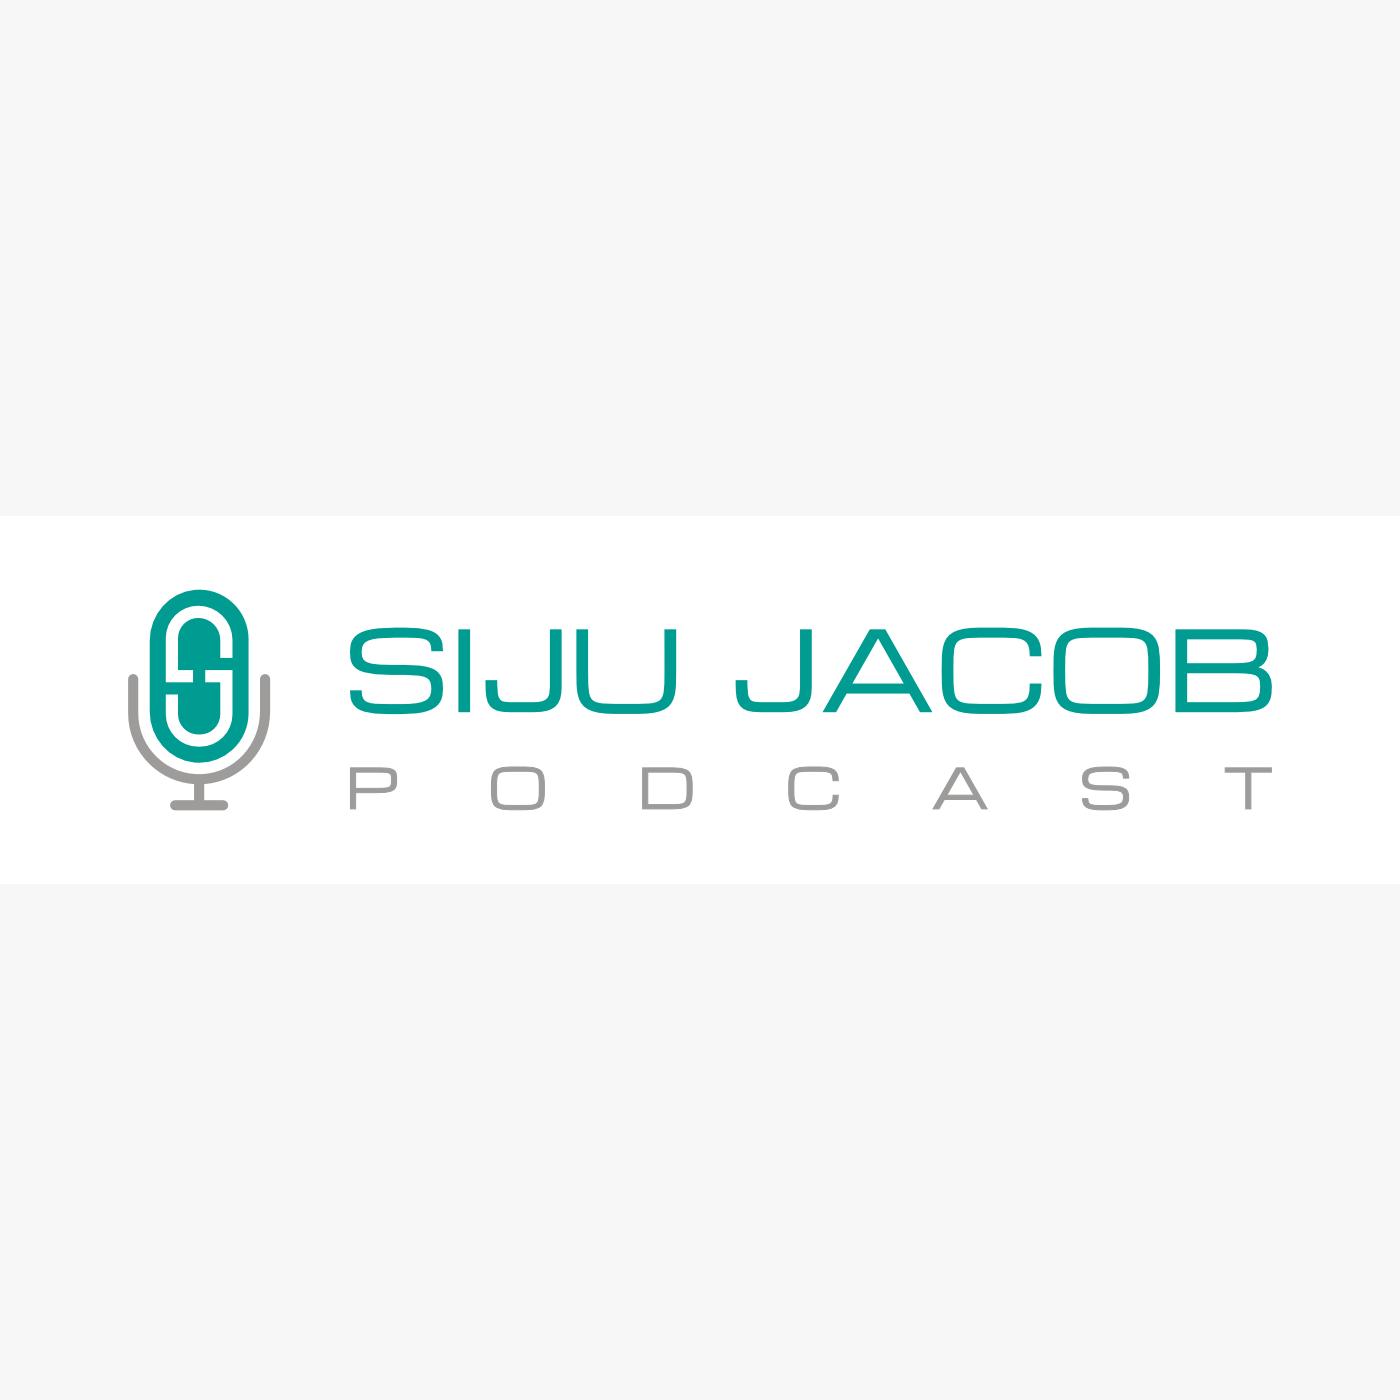 The Siju Jacob Podcast show art